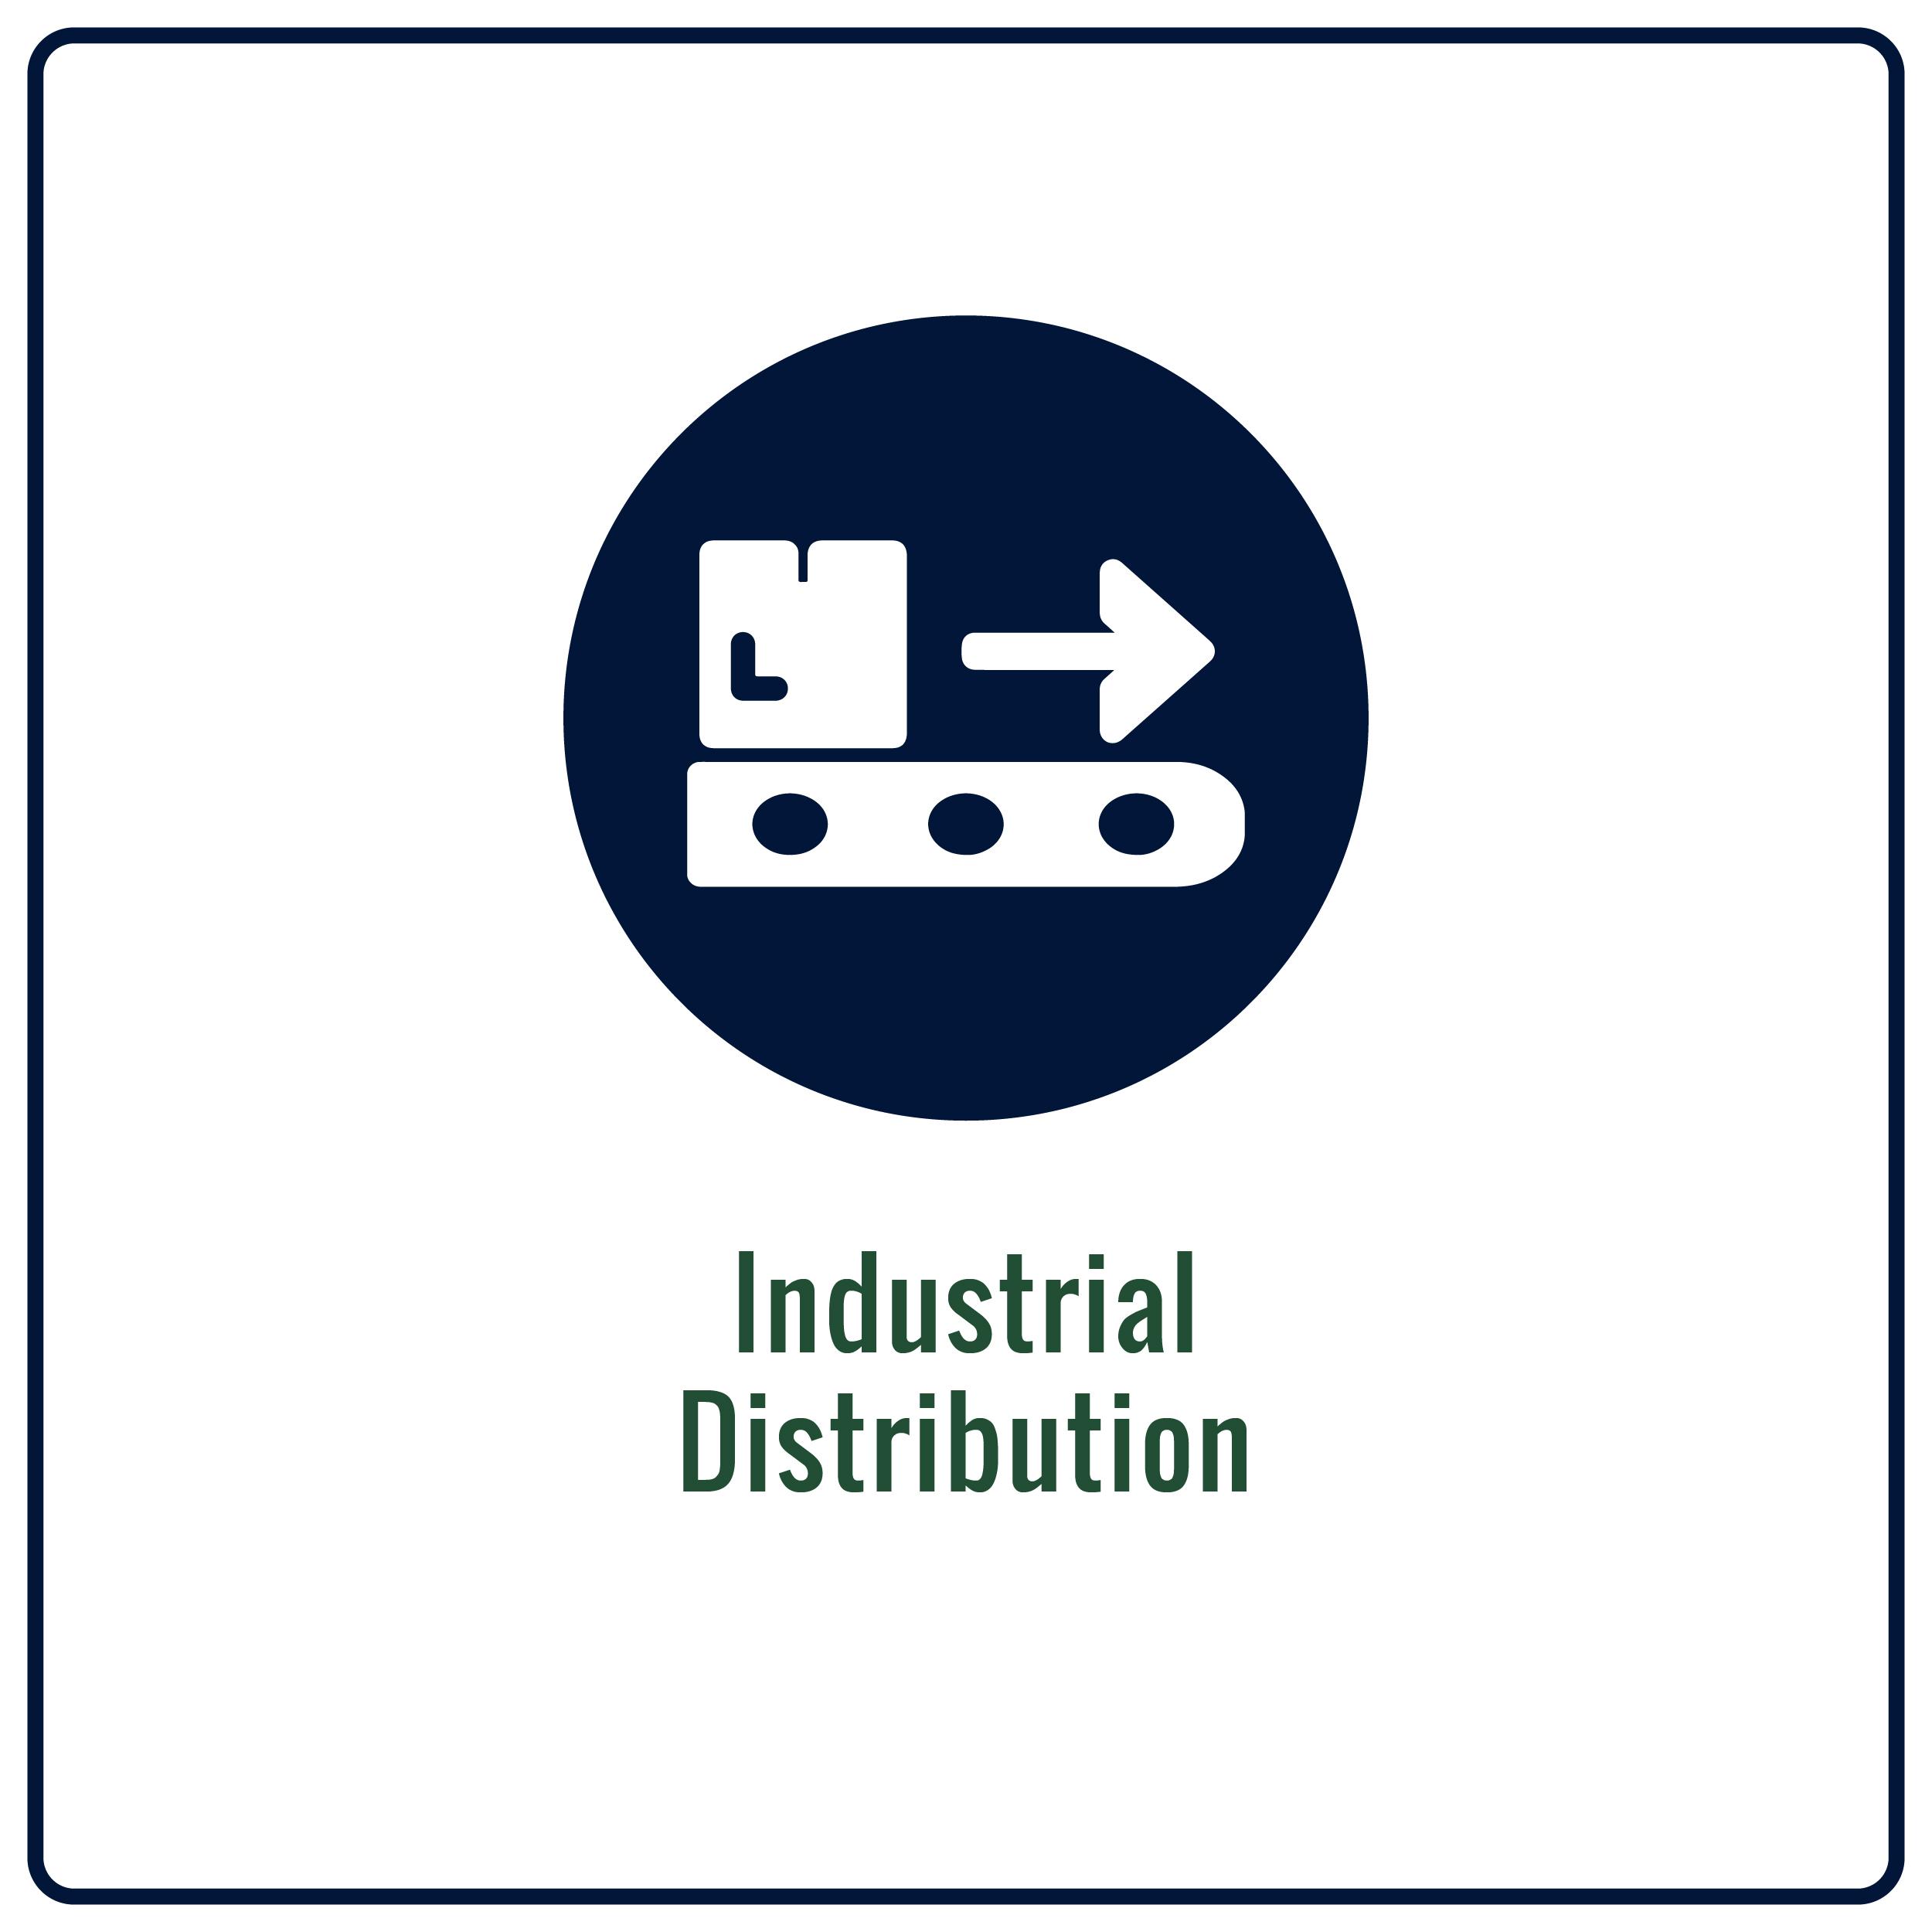 Industiral Distribution-01.jpg